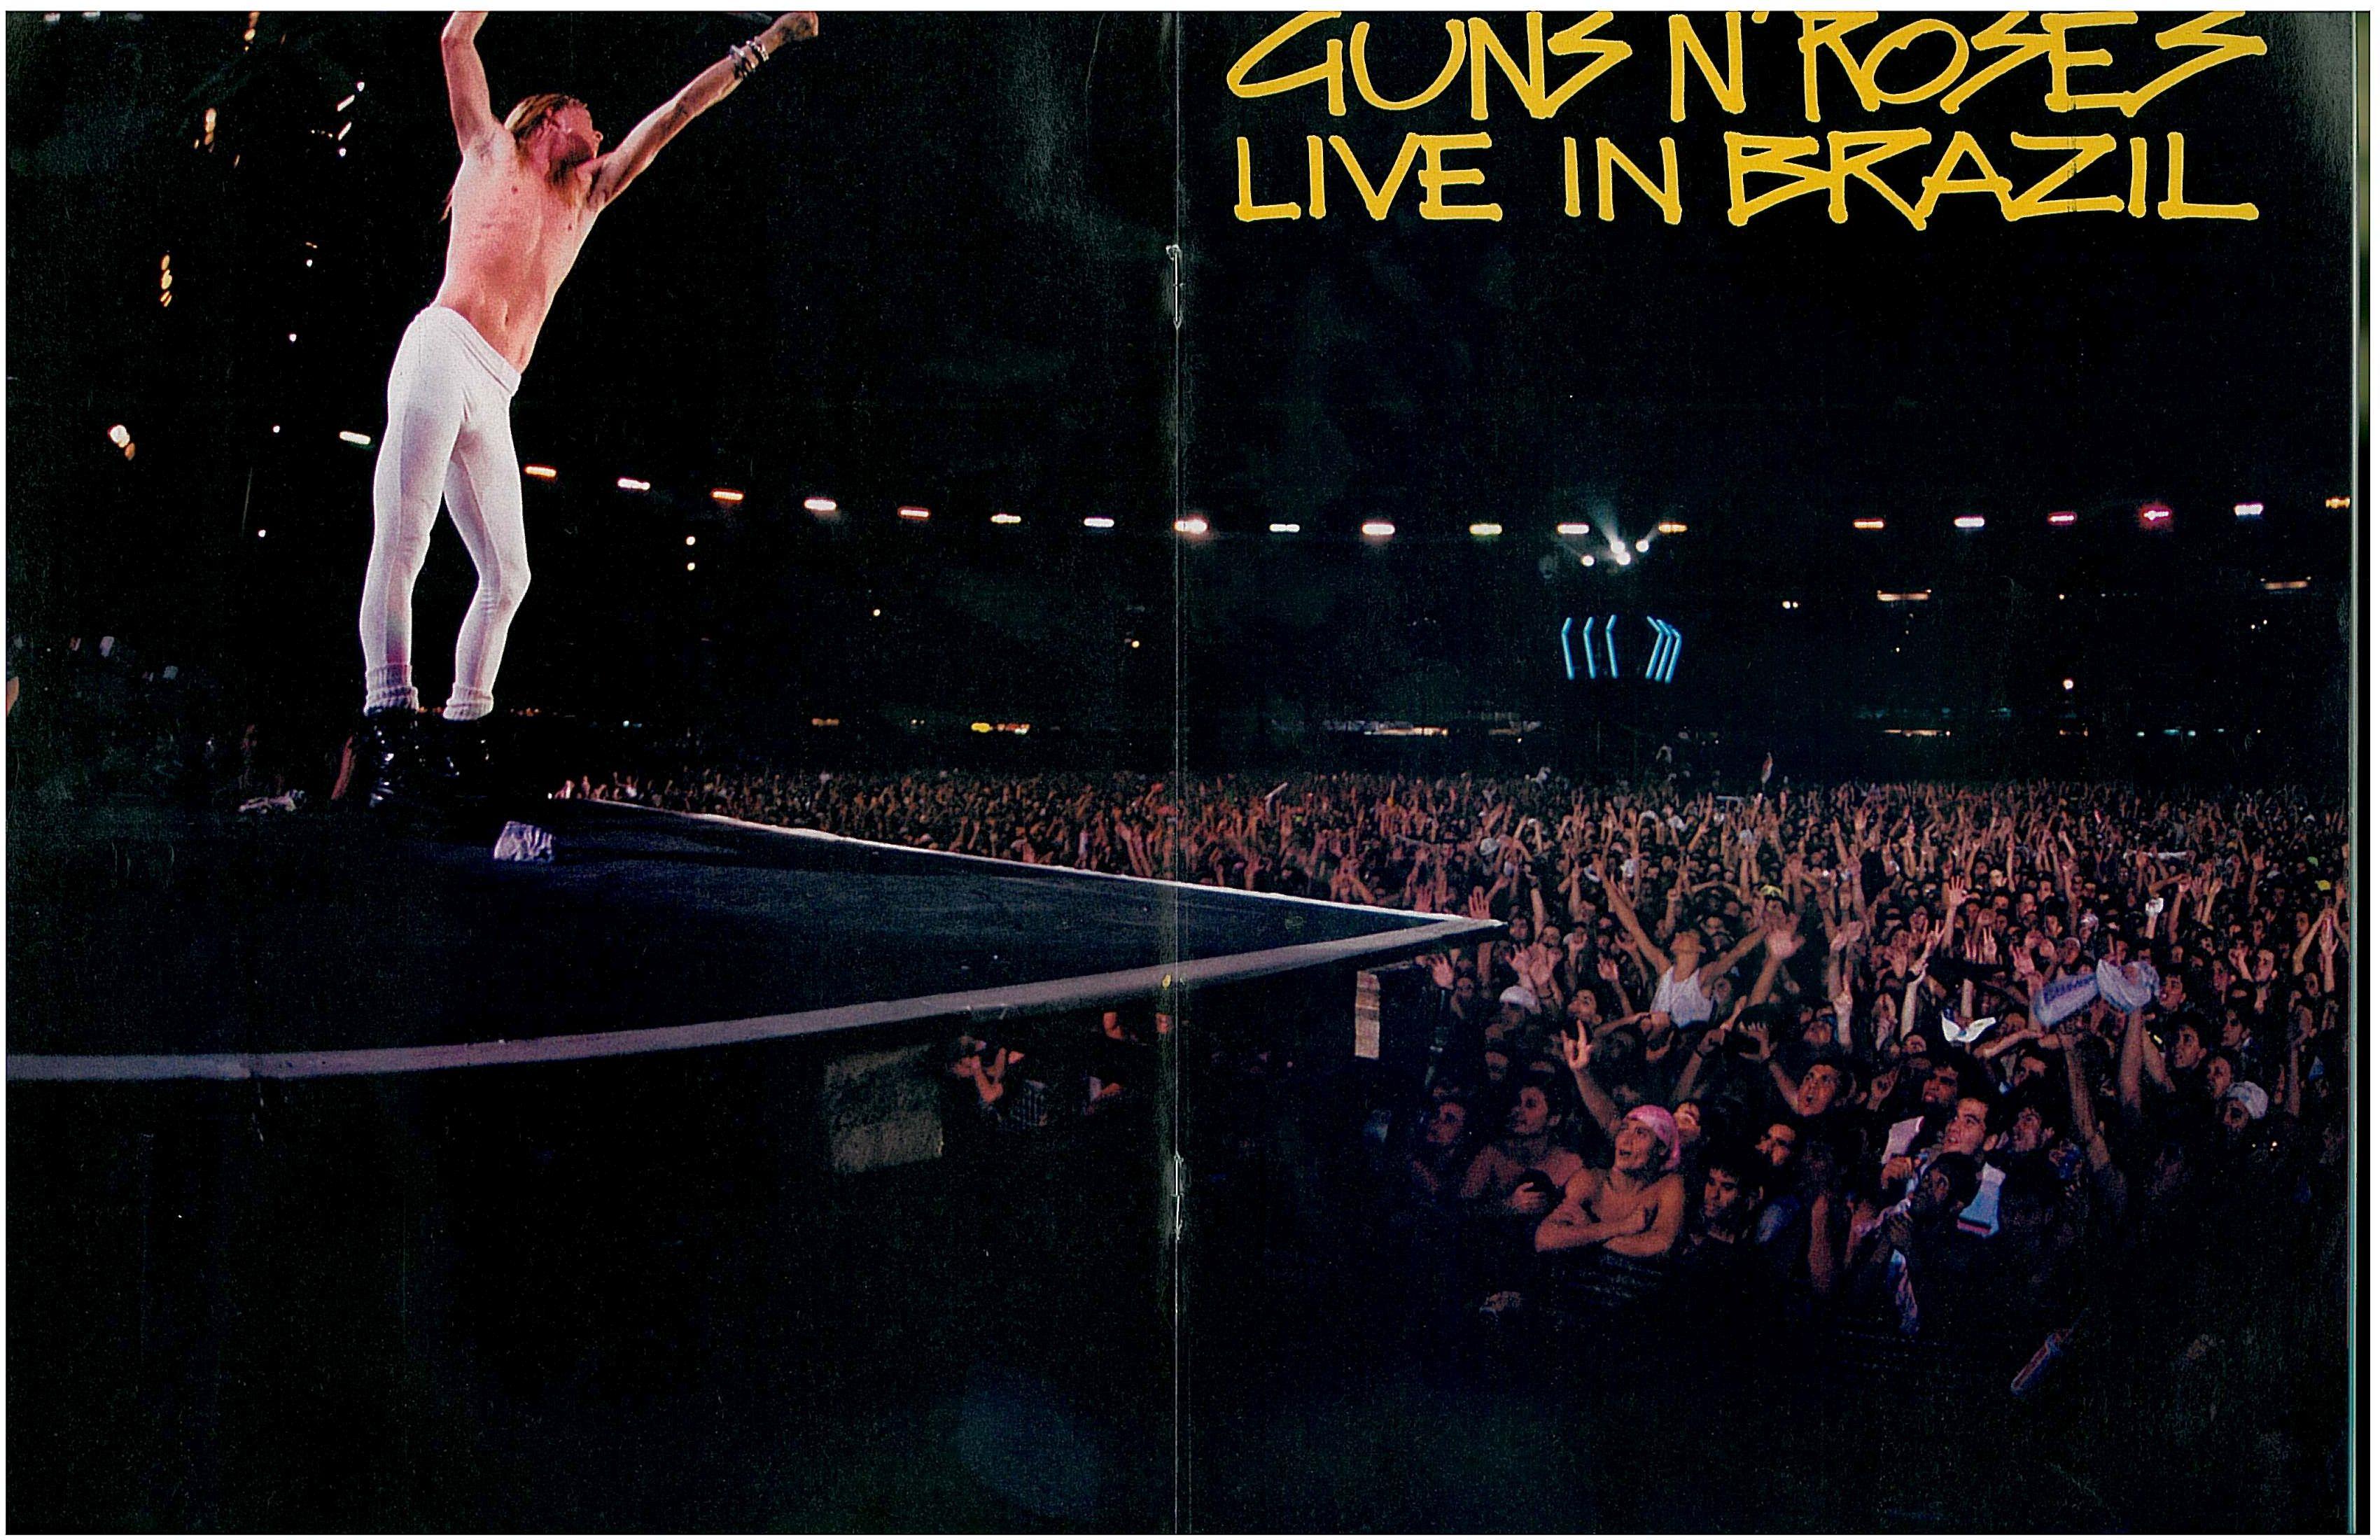 1991.02.09/16/23 - Kerrang - The Noize from Brazil (I, II, III) U8k9qgAO_o